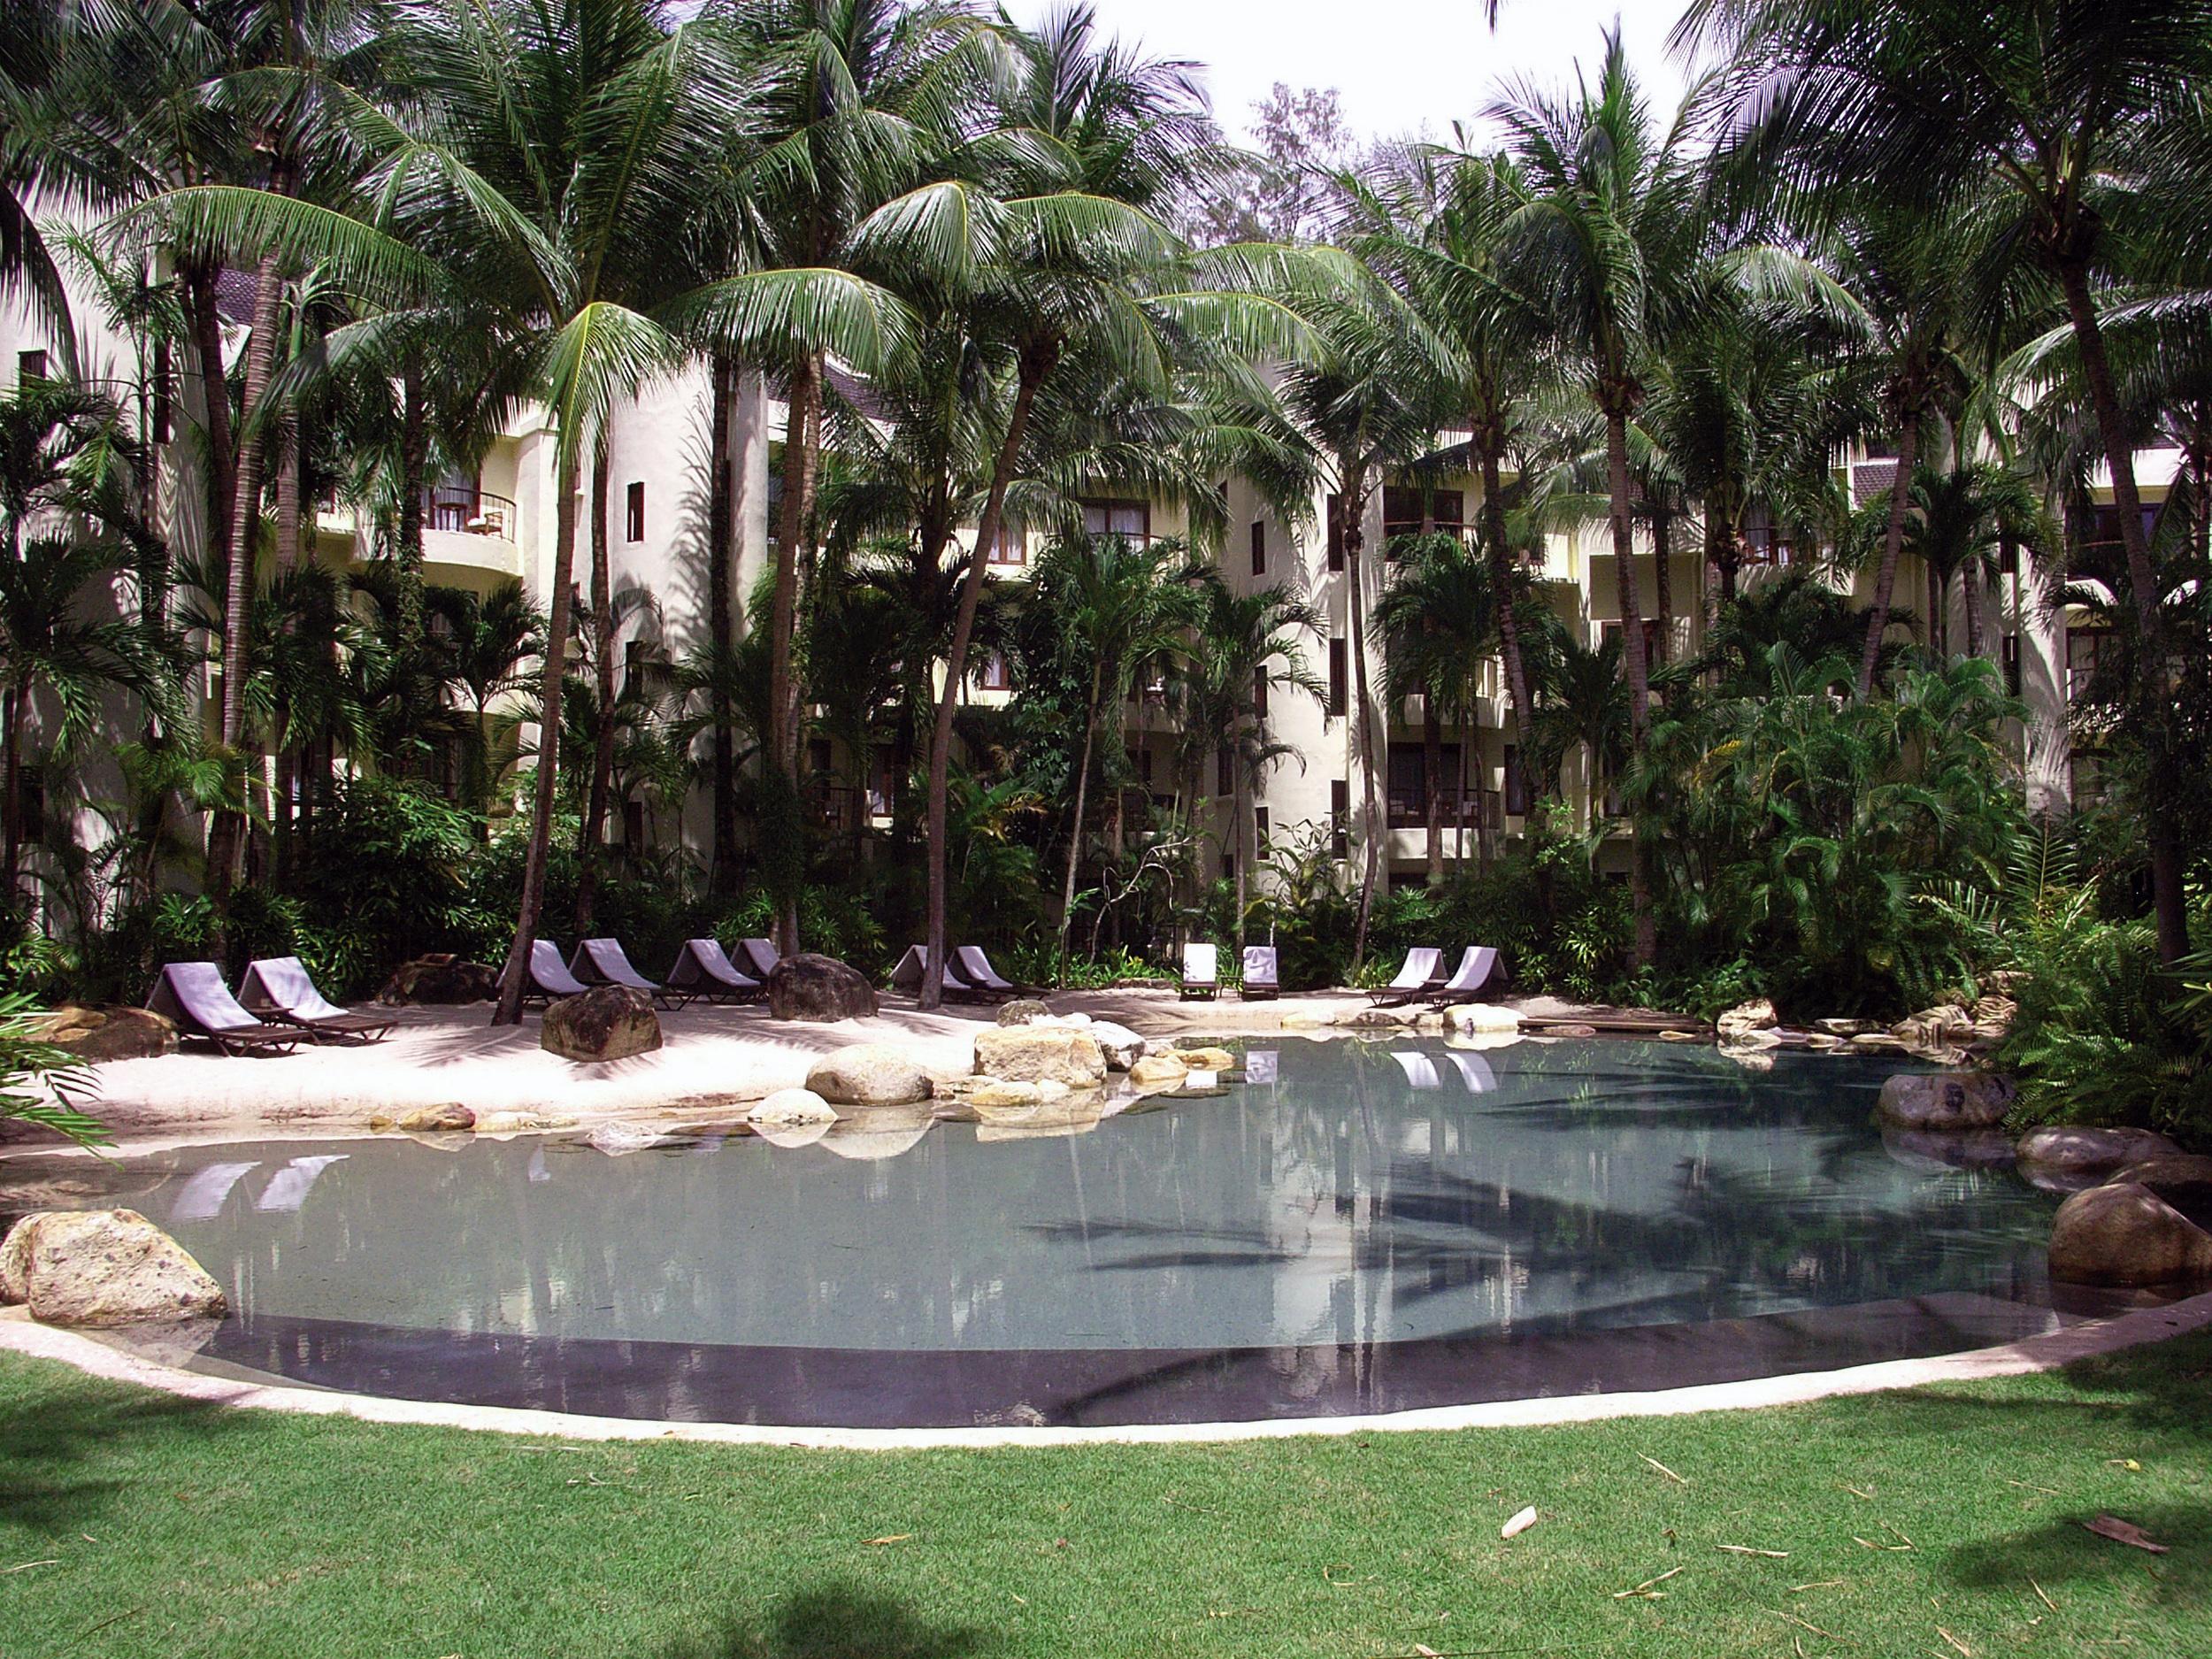 Garden hotel renovation